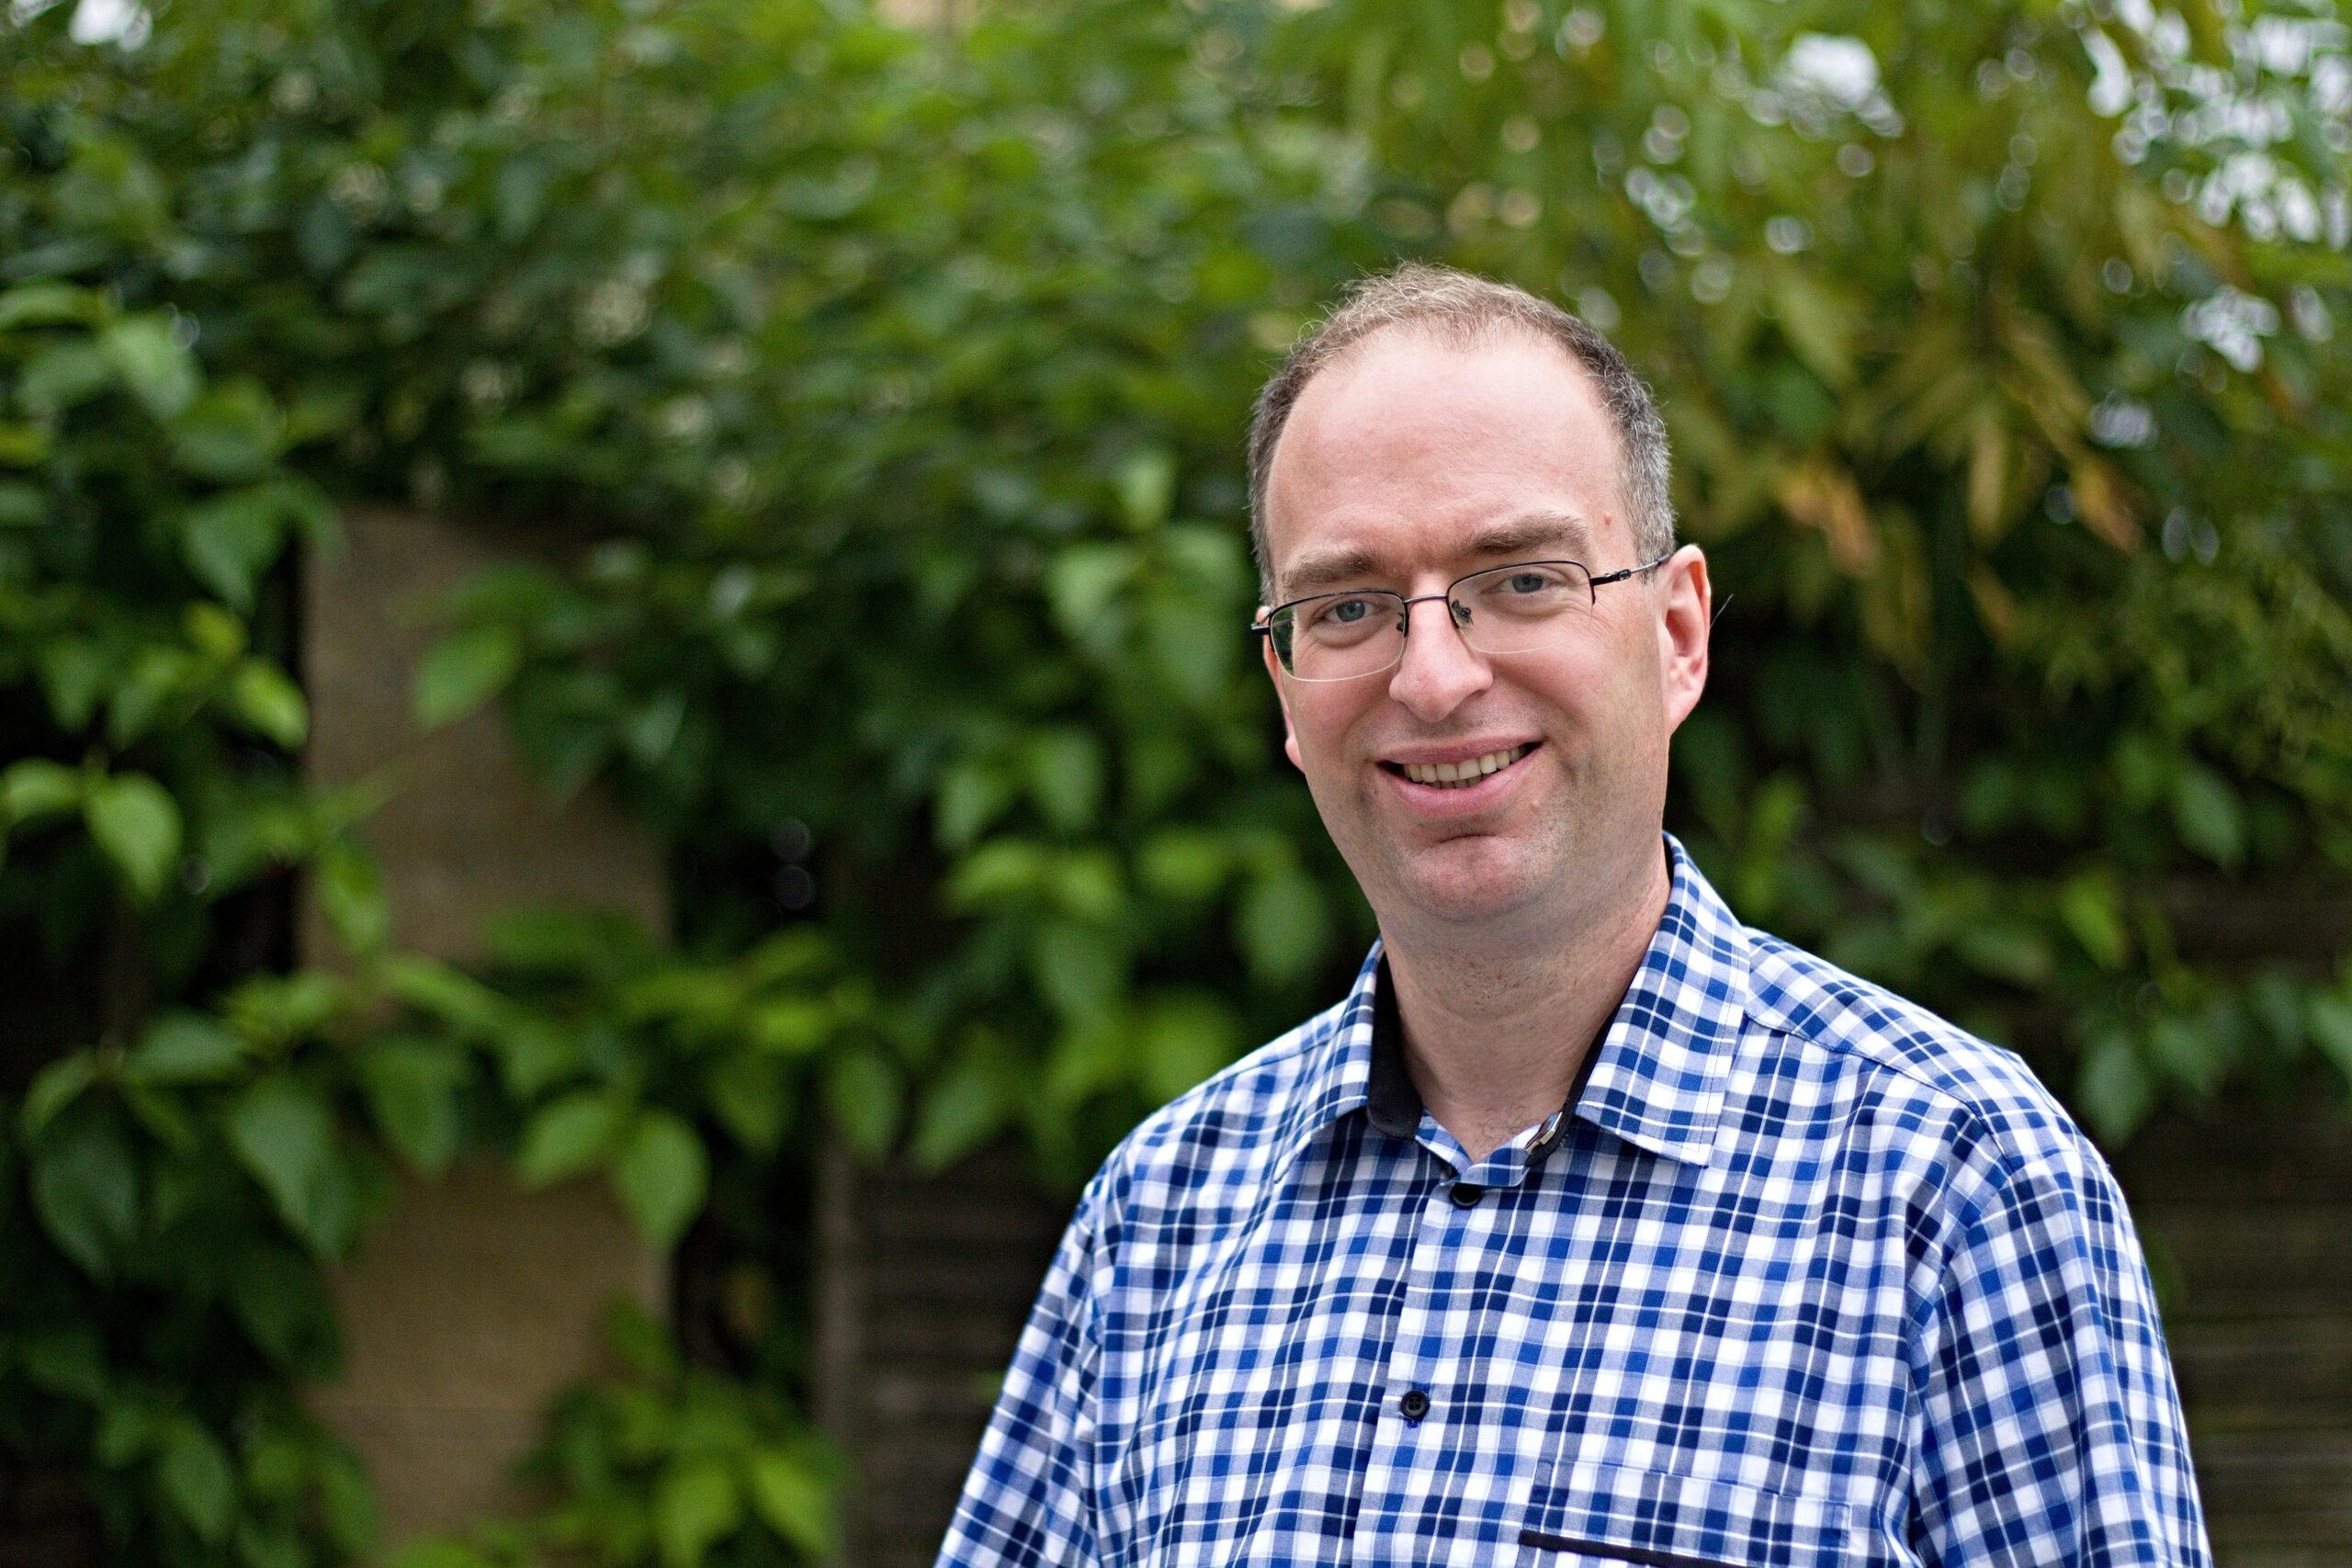 Patrick Zandl